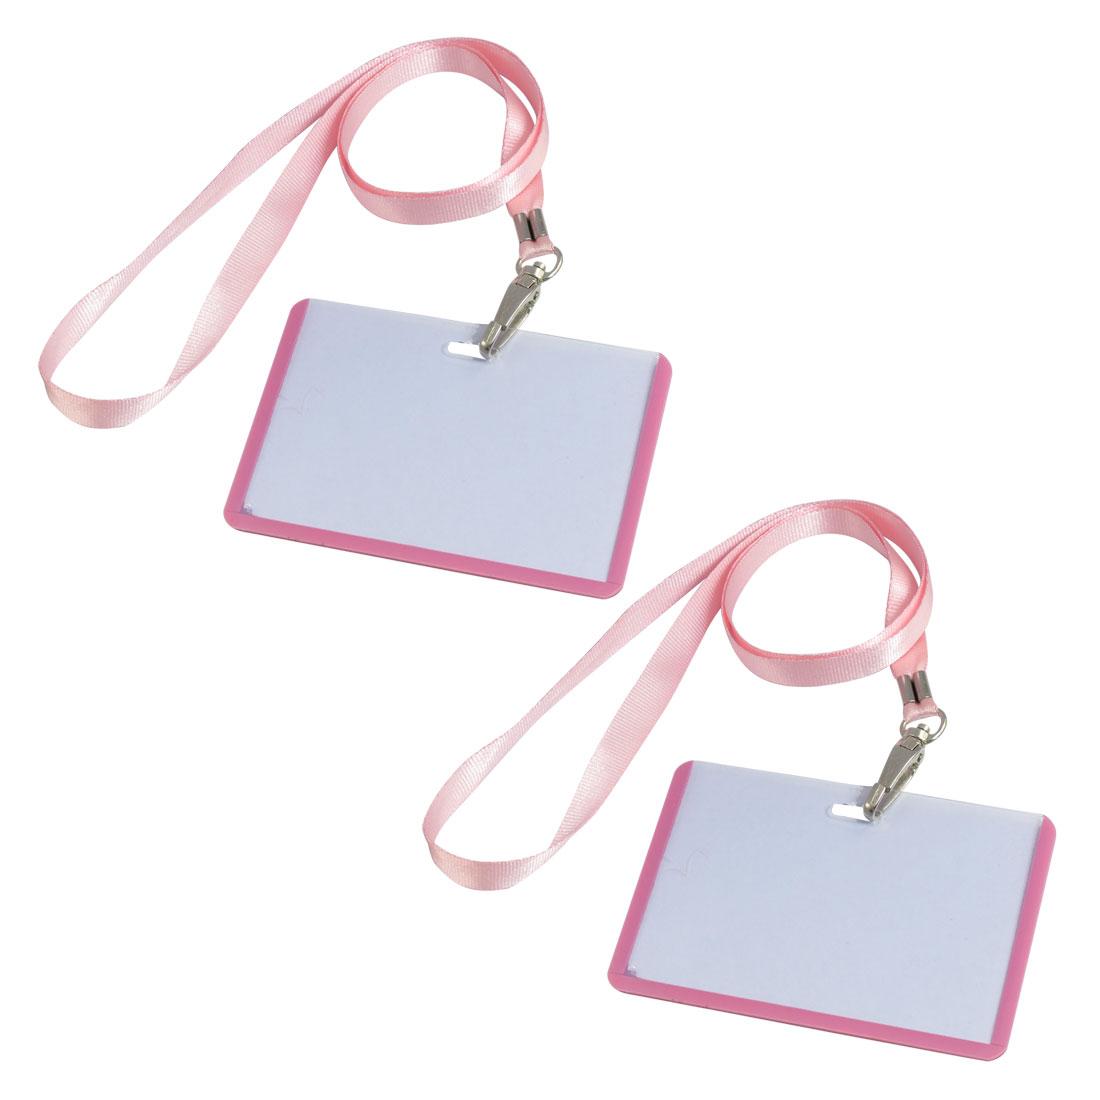 2 Pcs School Office Pink Lanyard Horizontal B8 ID Name Badge Card Holders